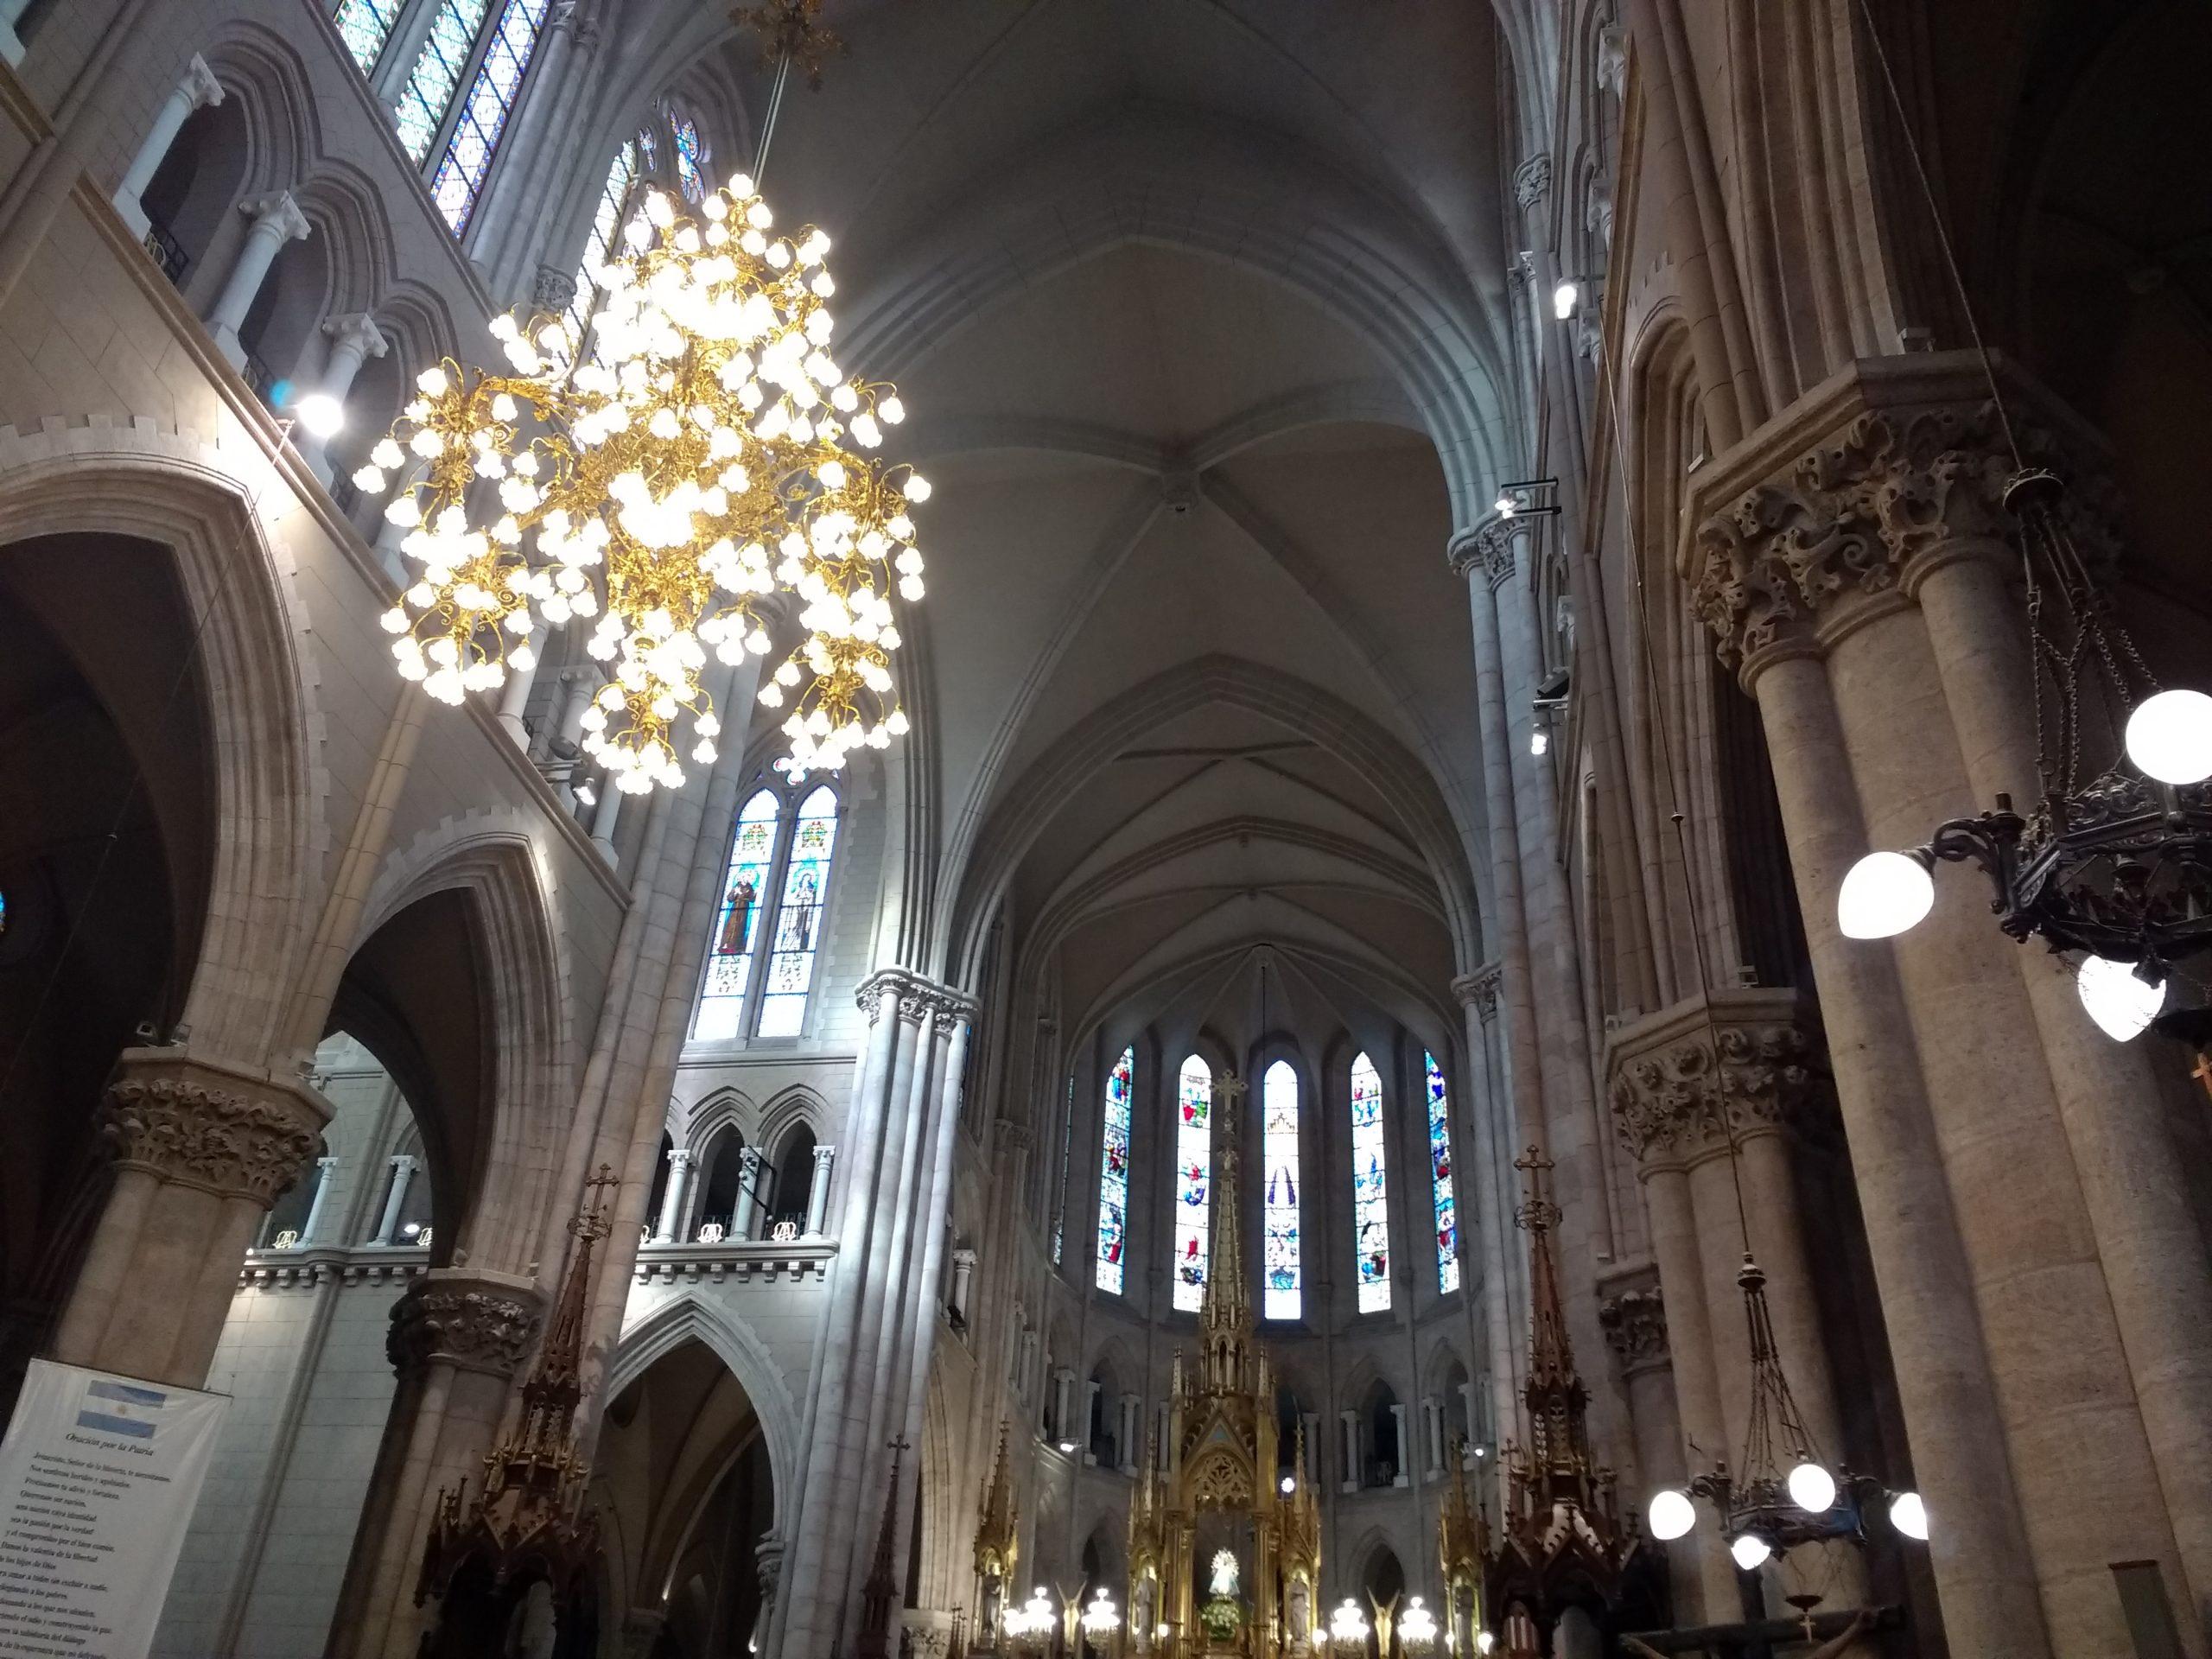 cathedral interior c